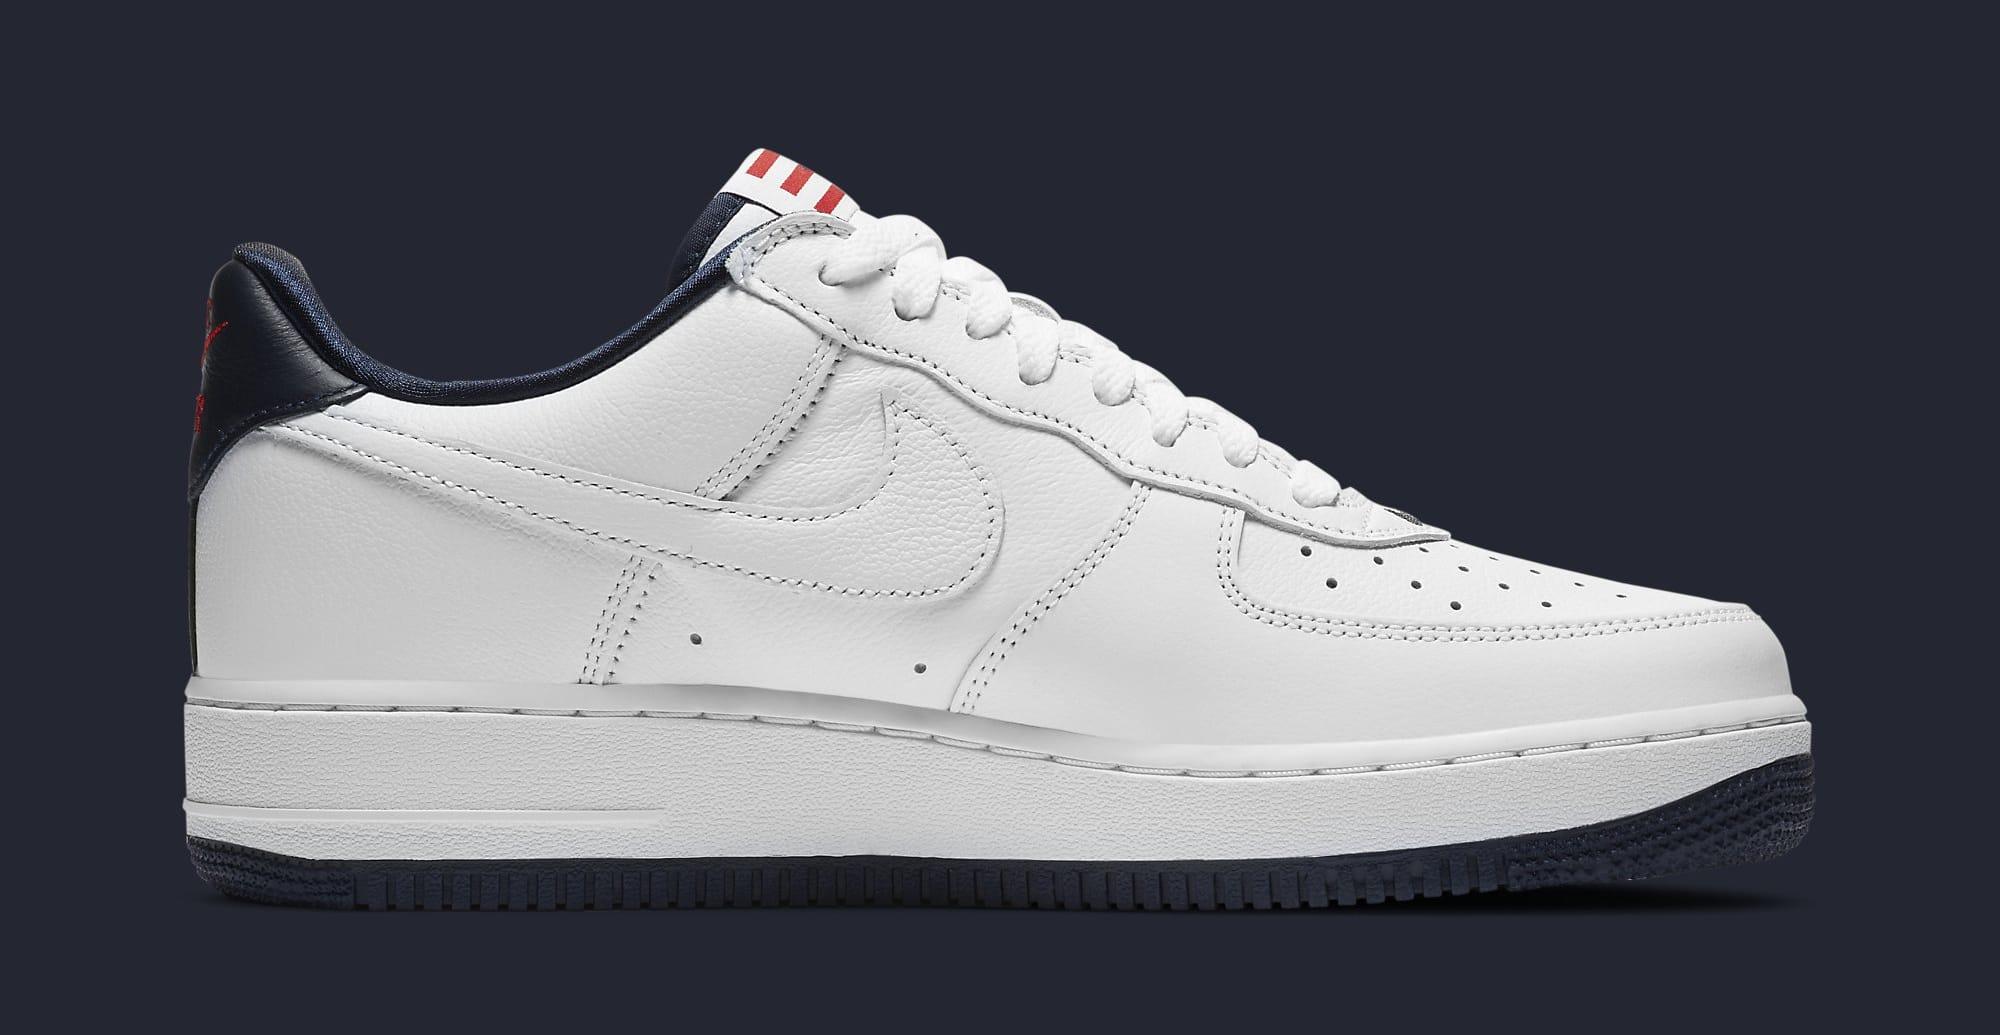 Nike Air Force 1 Low 'Puerto Rico' 2020 CJ1386-100 Medial